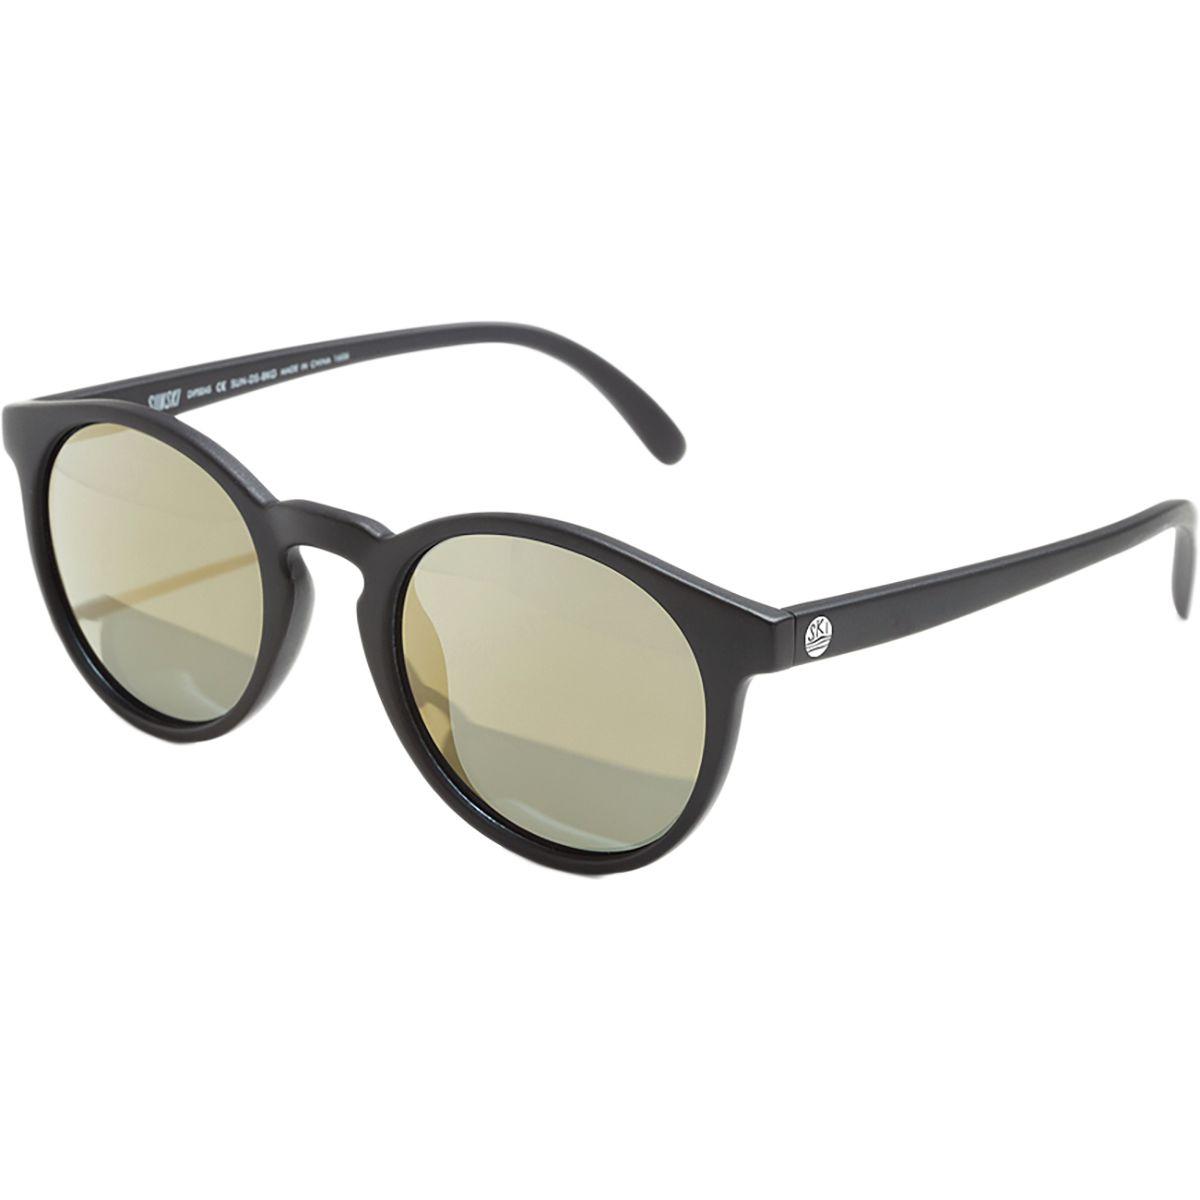 Sunski Dipsea Sunglasses  Polarized Black Gold One Size